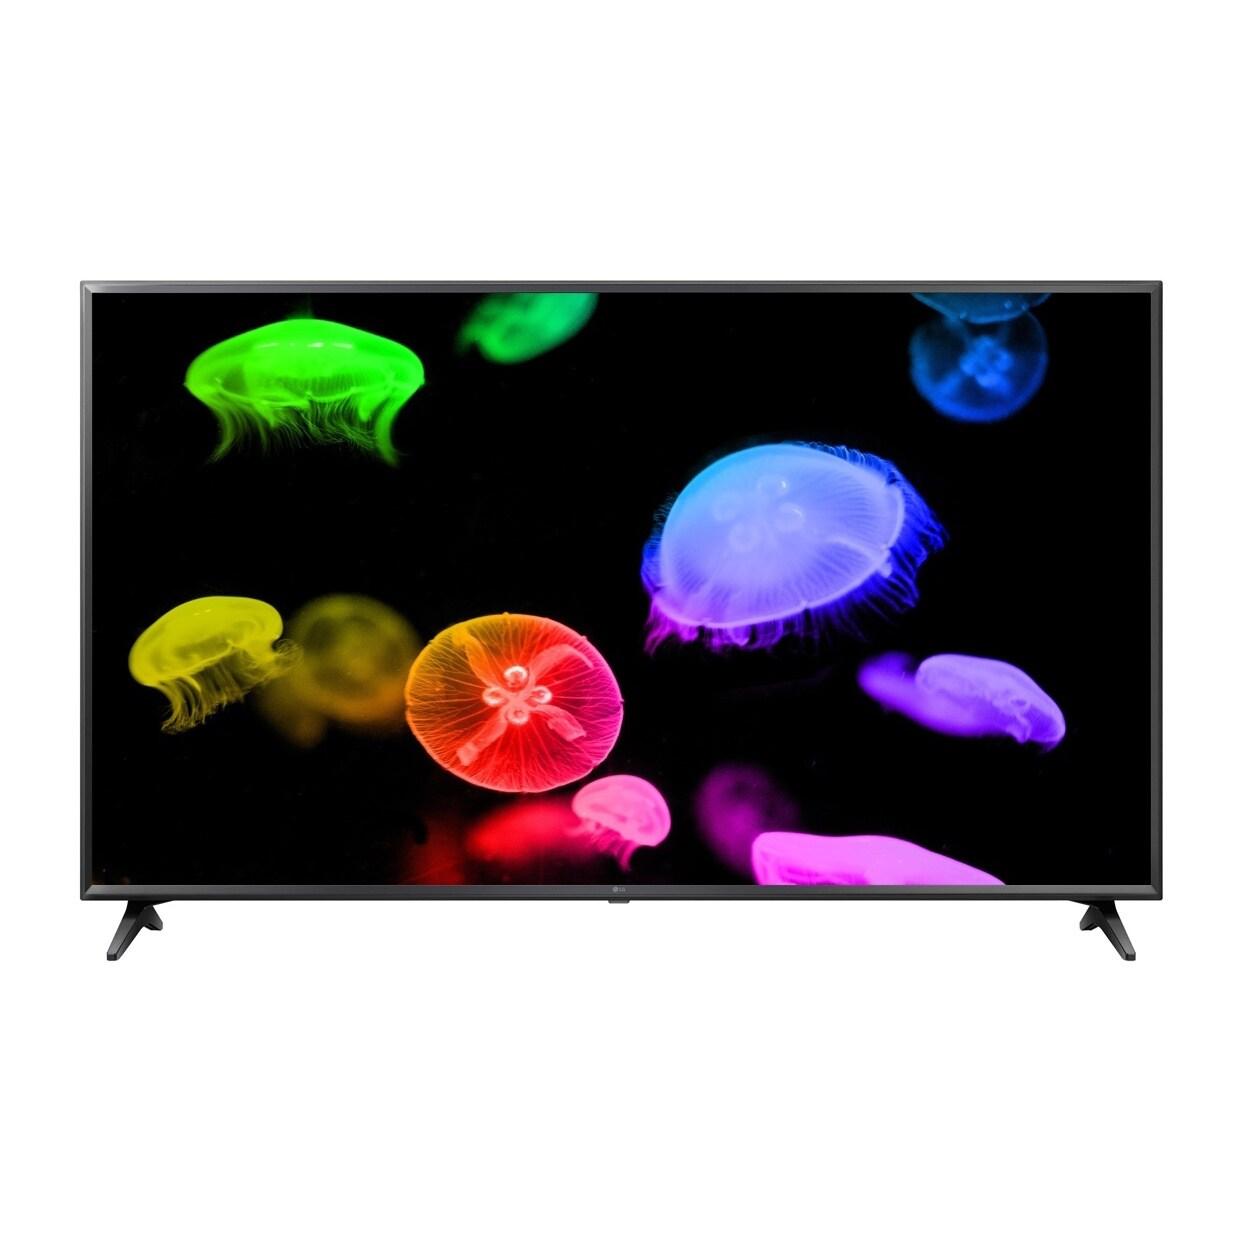 Best Deals - 32 inch LED TVs